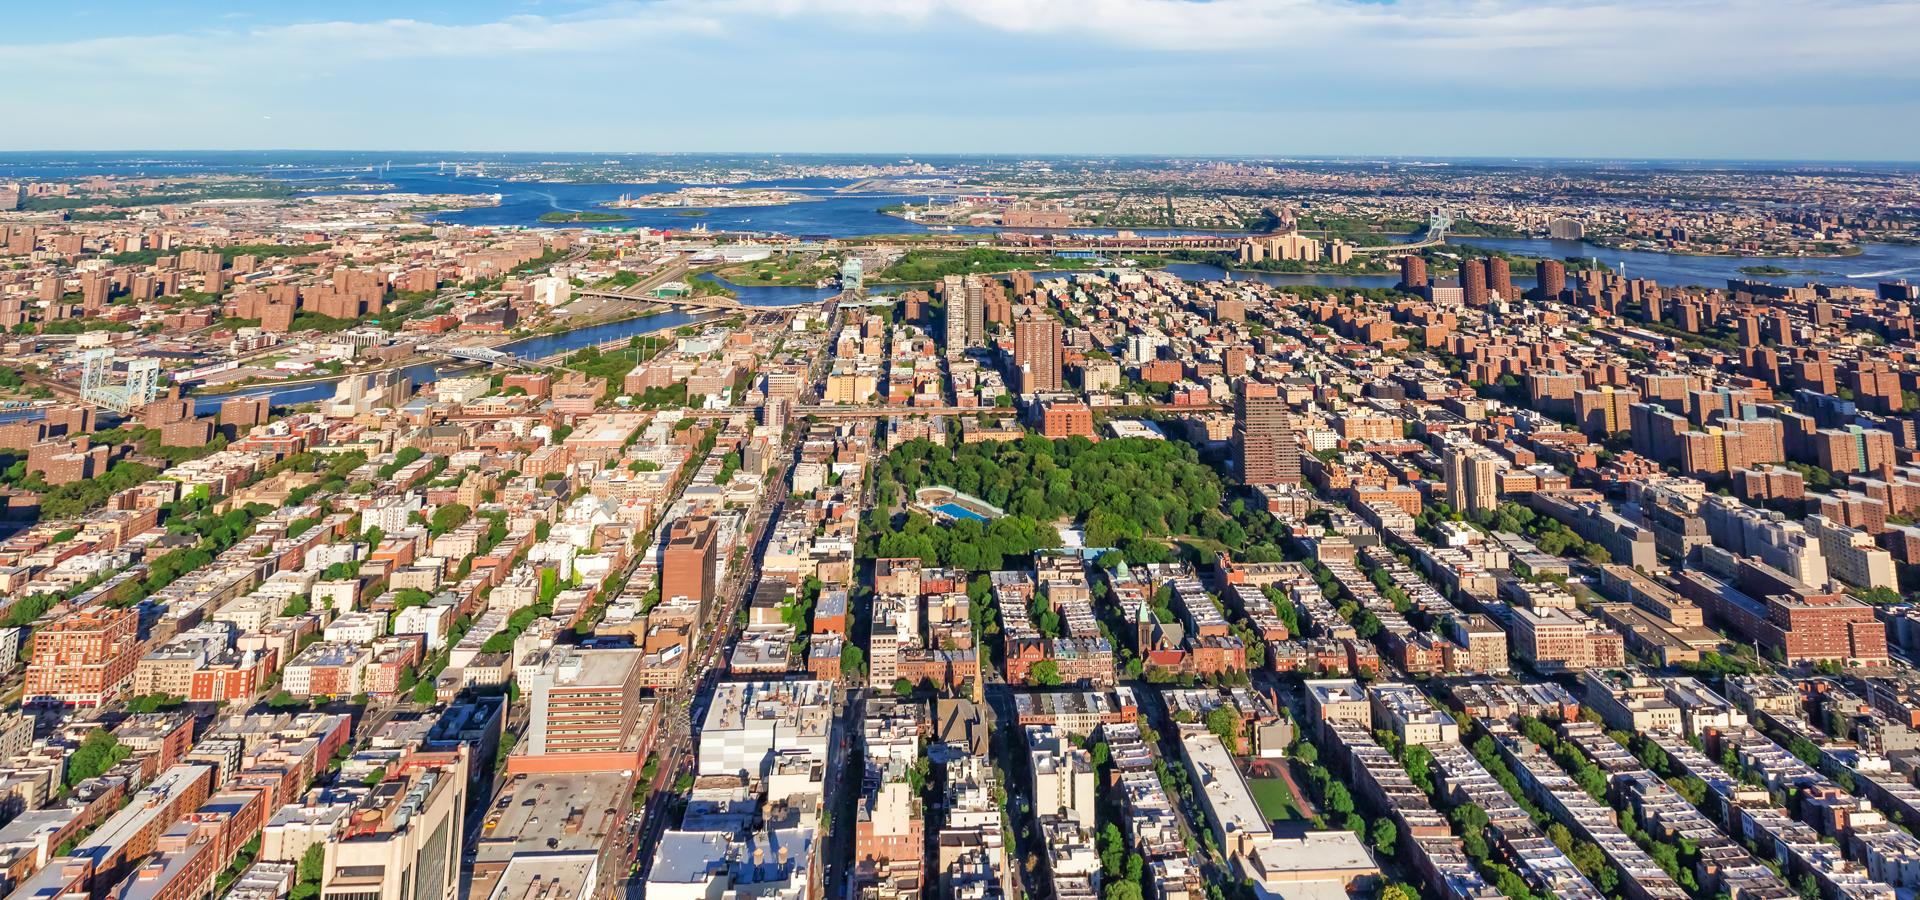 Peer-to-peer advisory in The Bronx, New York, USA